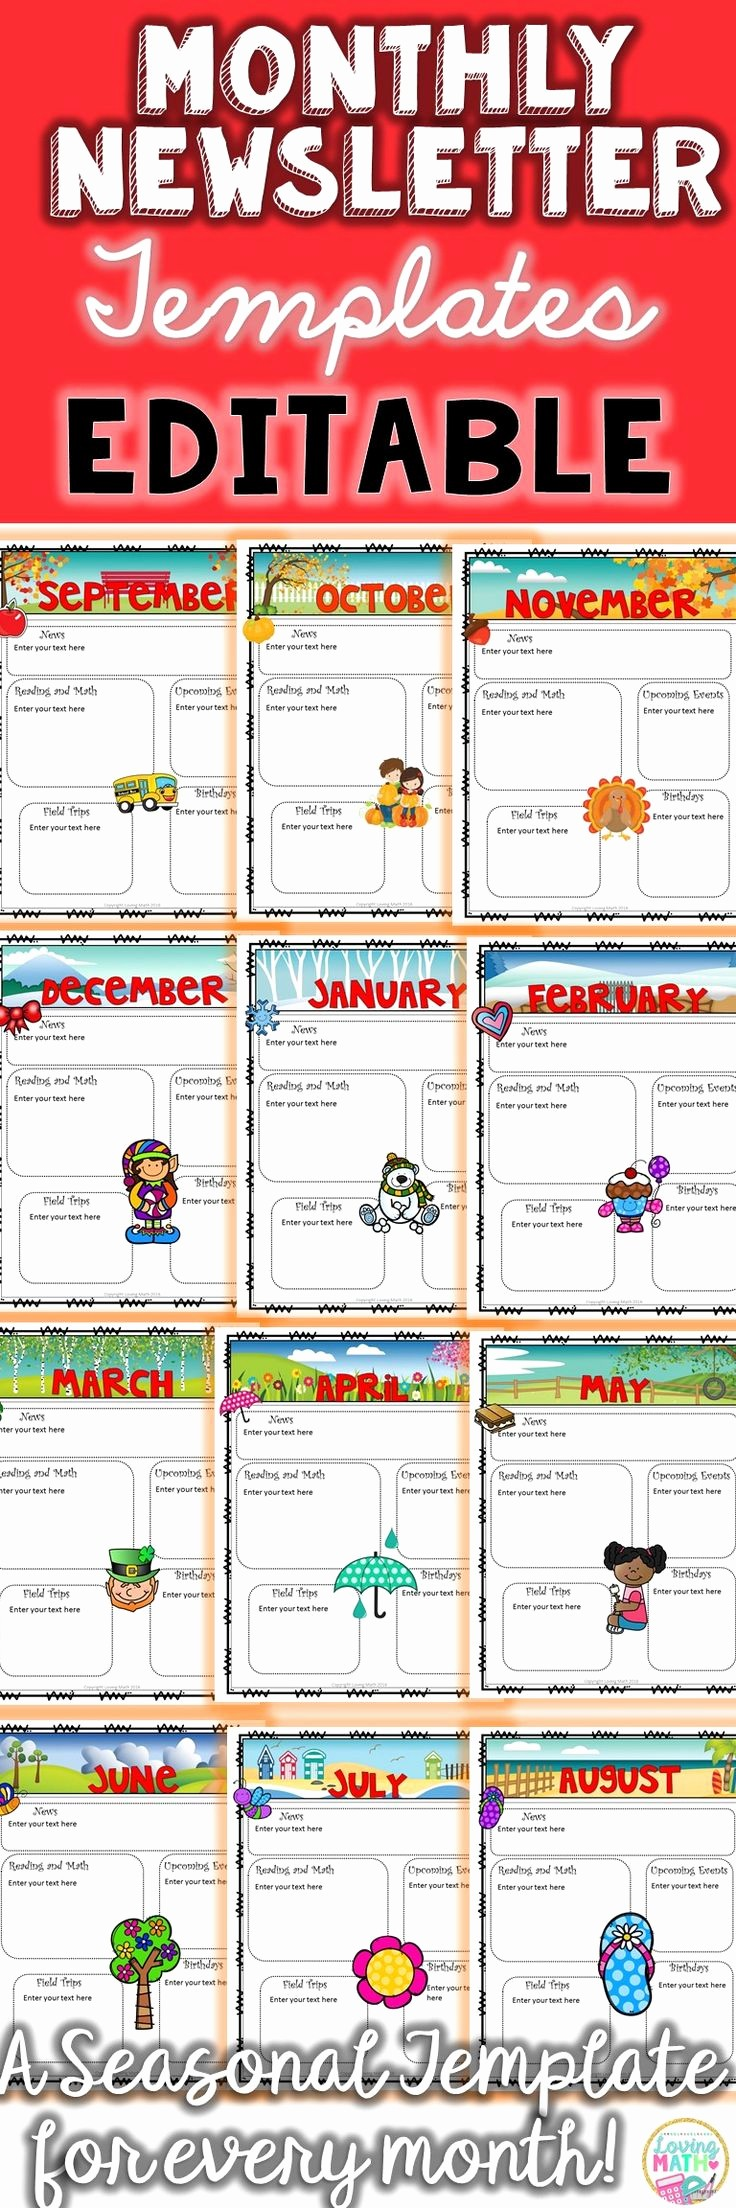 News Letter Templates for Teachers Inspirational Best 25 Preschool Newsletter Ideas On Pinterest